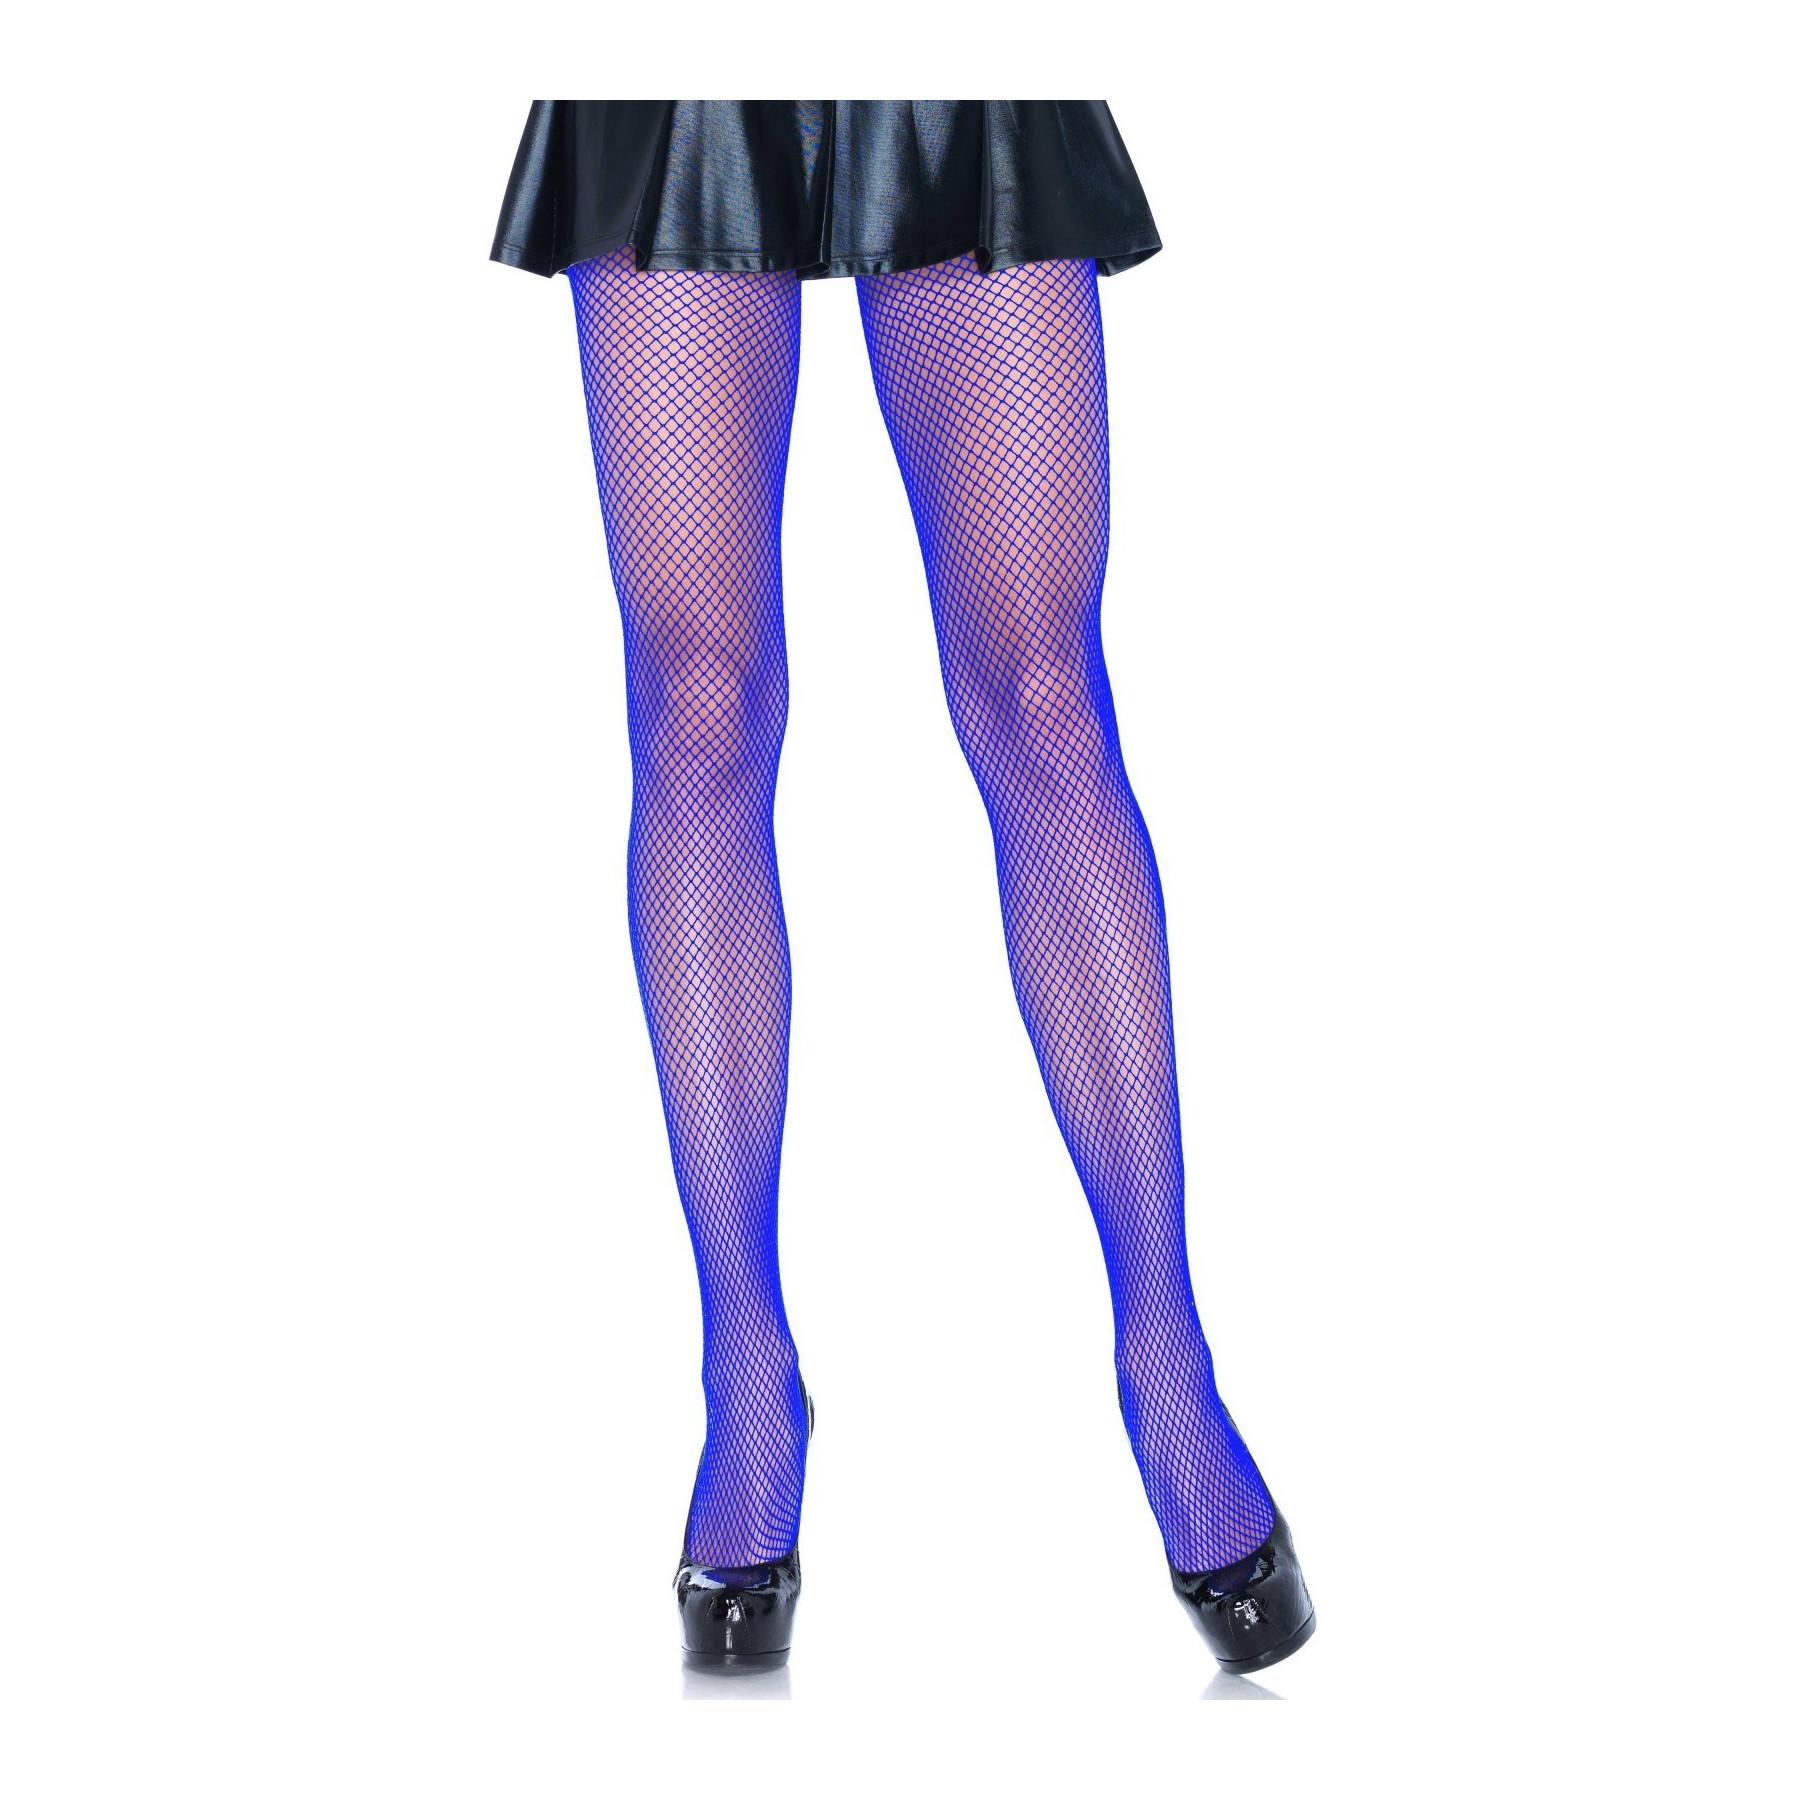 Calze a rete collant colorati blu Leg Avenue